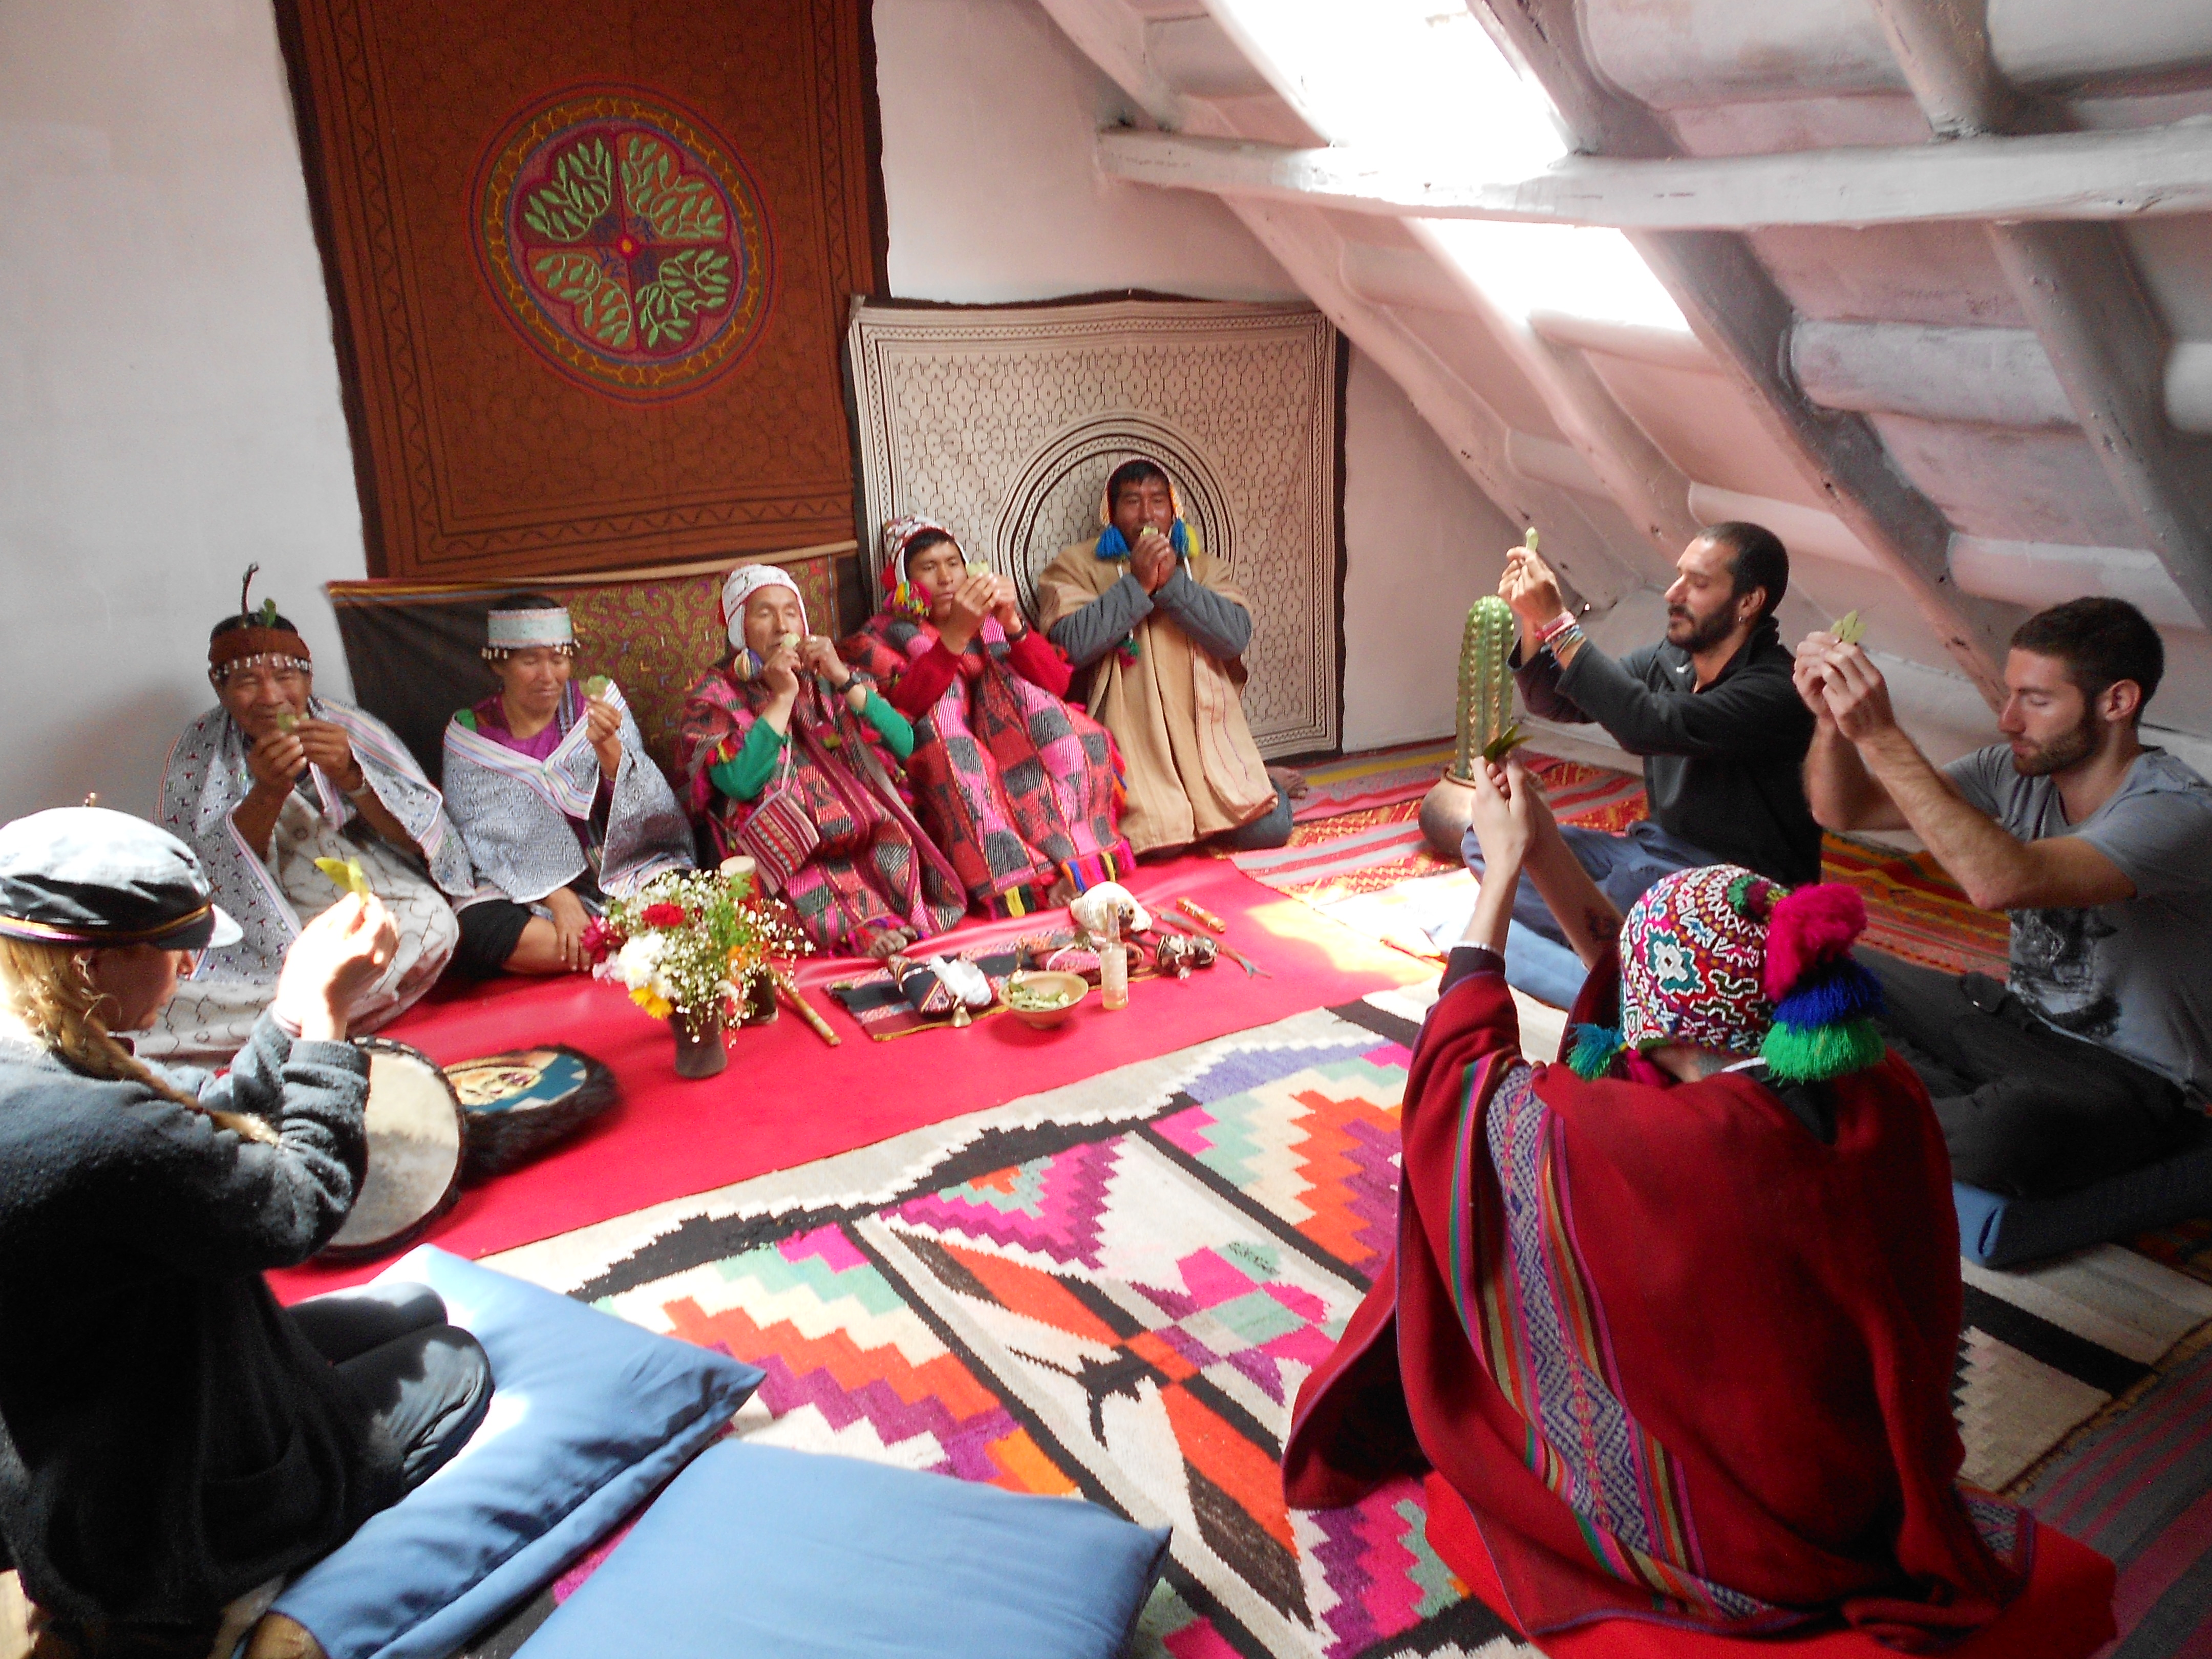 Centro Ancestral Inca Shamanico Amazonico Espiritual